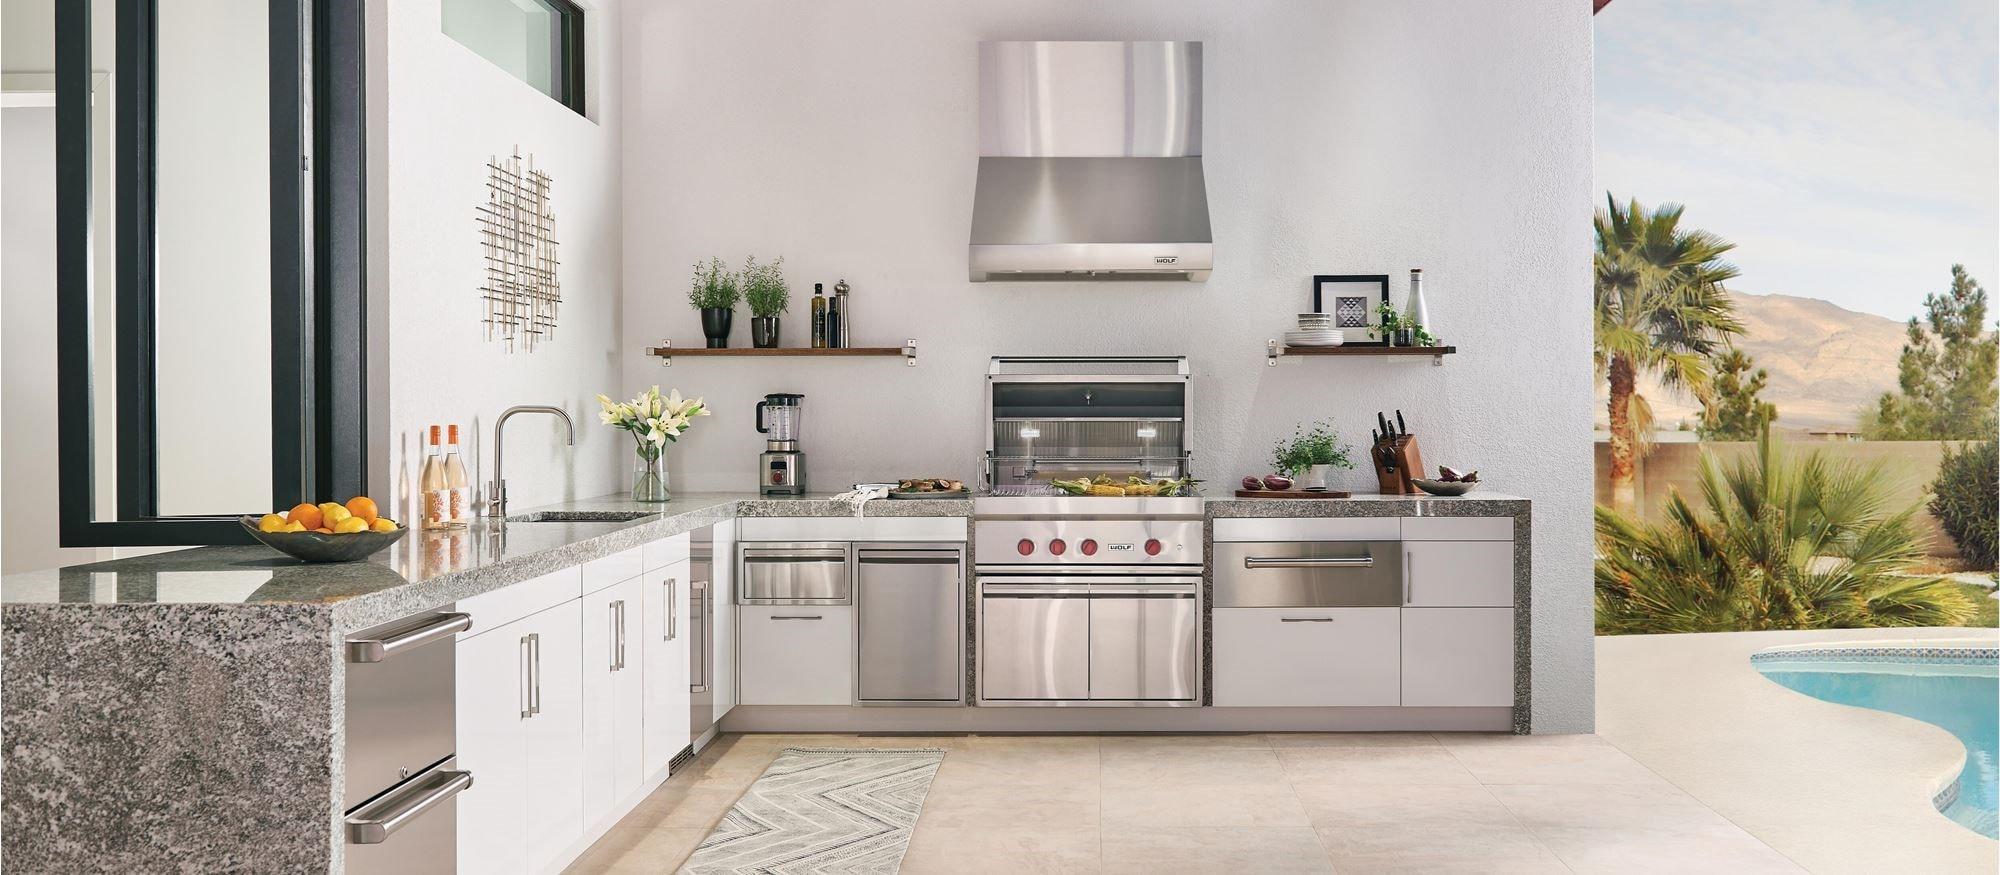 [CSDW_4250]   Outdoor Grills | Gas Grills | Wolf Outdoor Appliances | Outdoor Kitchen Electrical Wiring Diagram |  | Sub-Zero